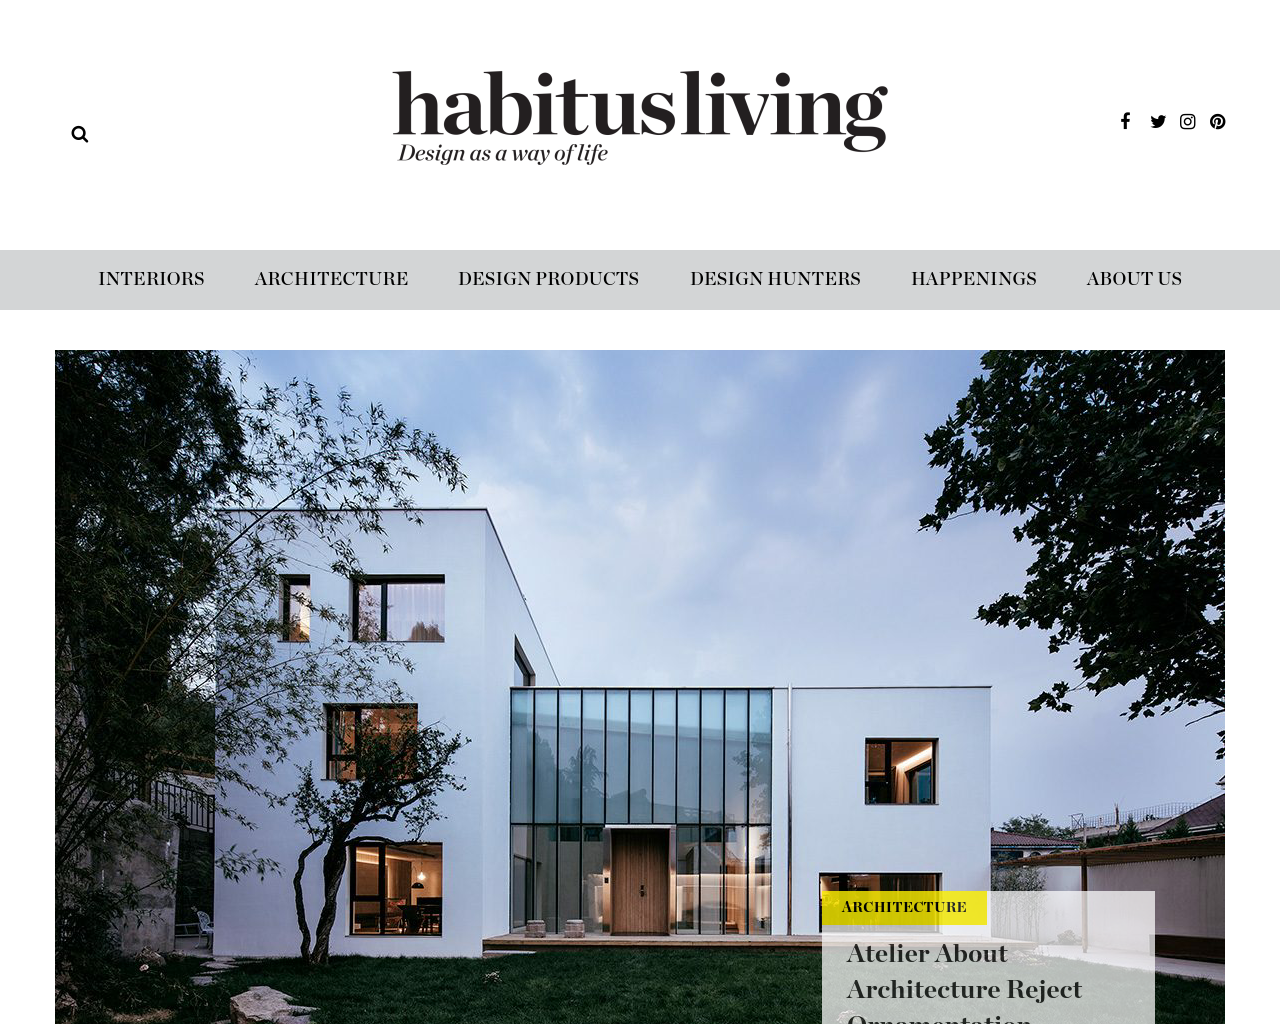 habitusliving-Advertising-Reviews-Pricing